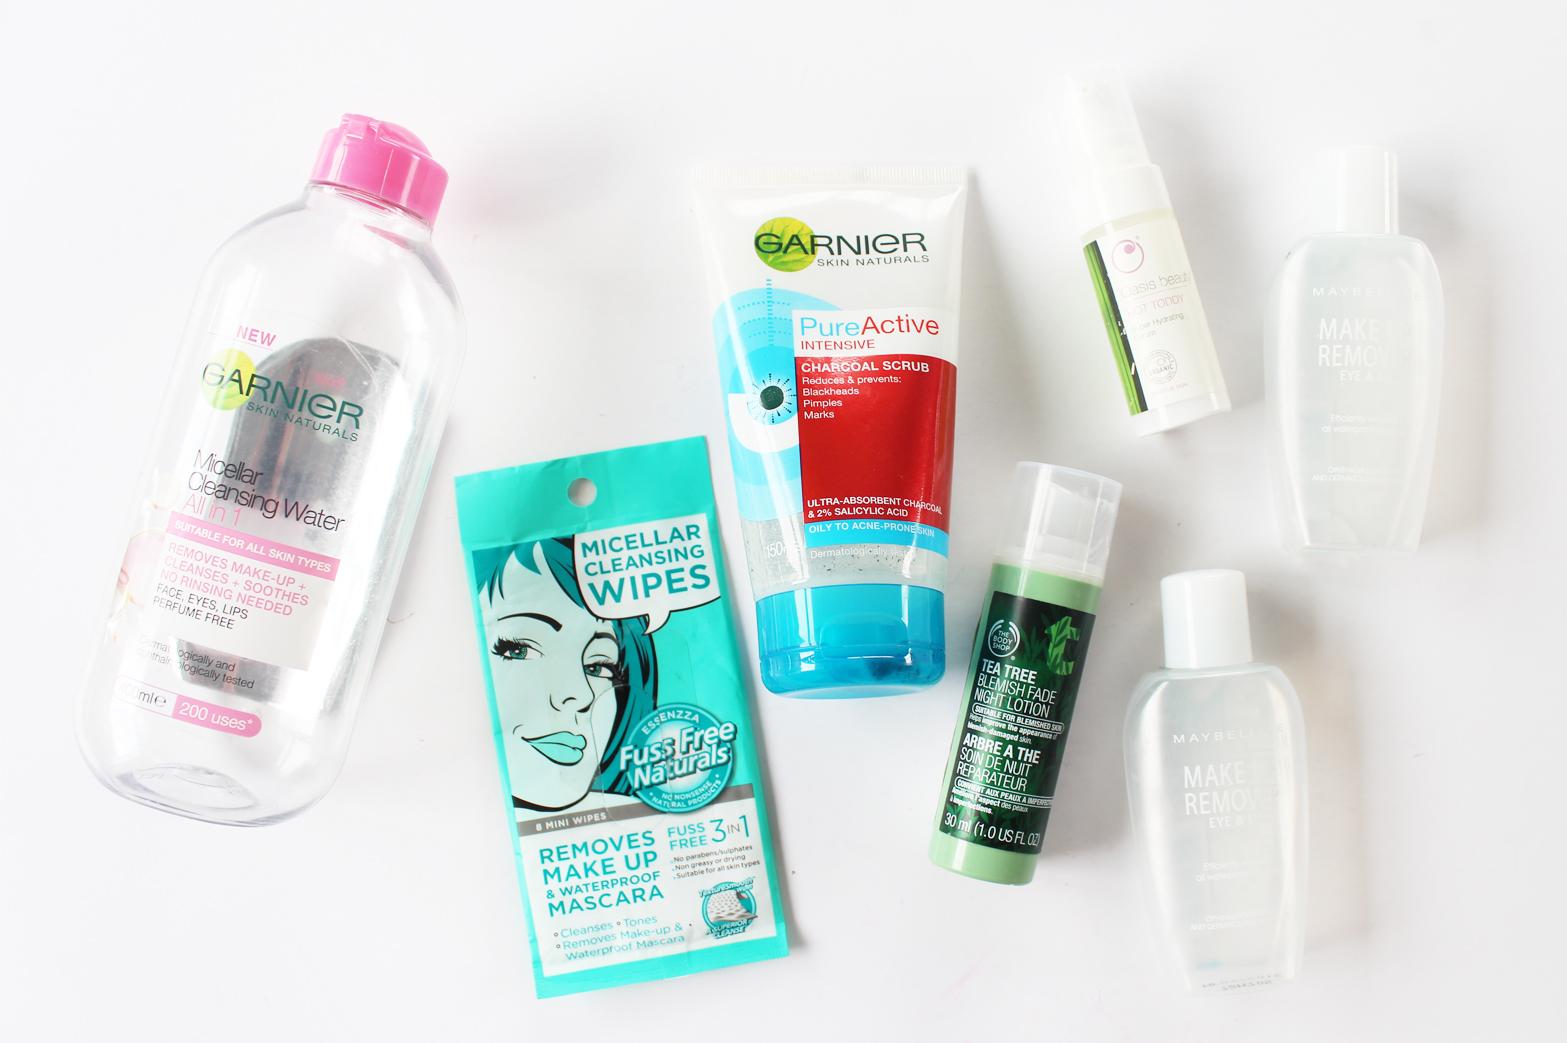 EMPTIES | February '16 - Skincare, Makeup, Hair + More - CassandraMyee